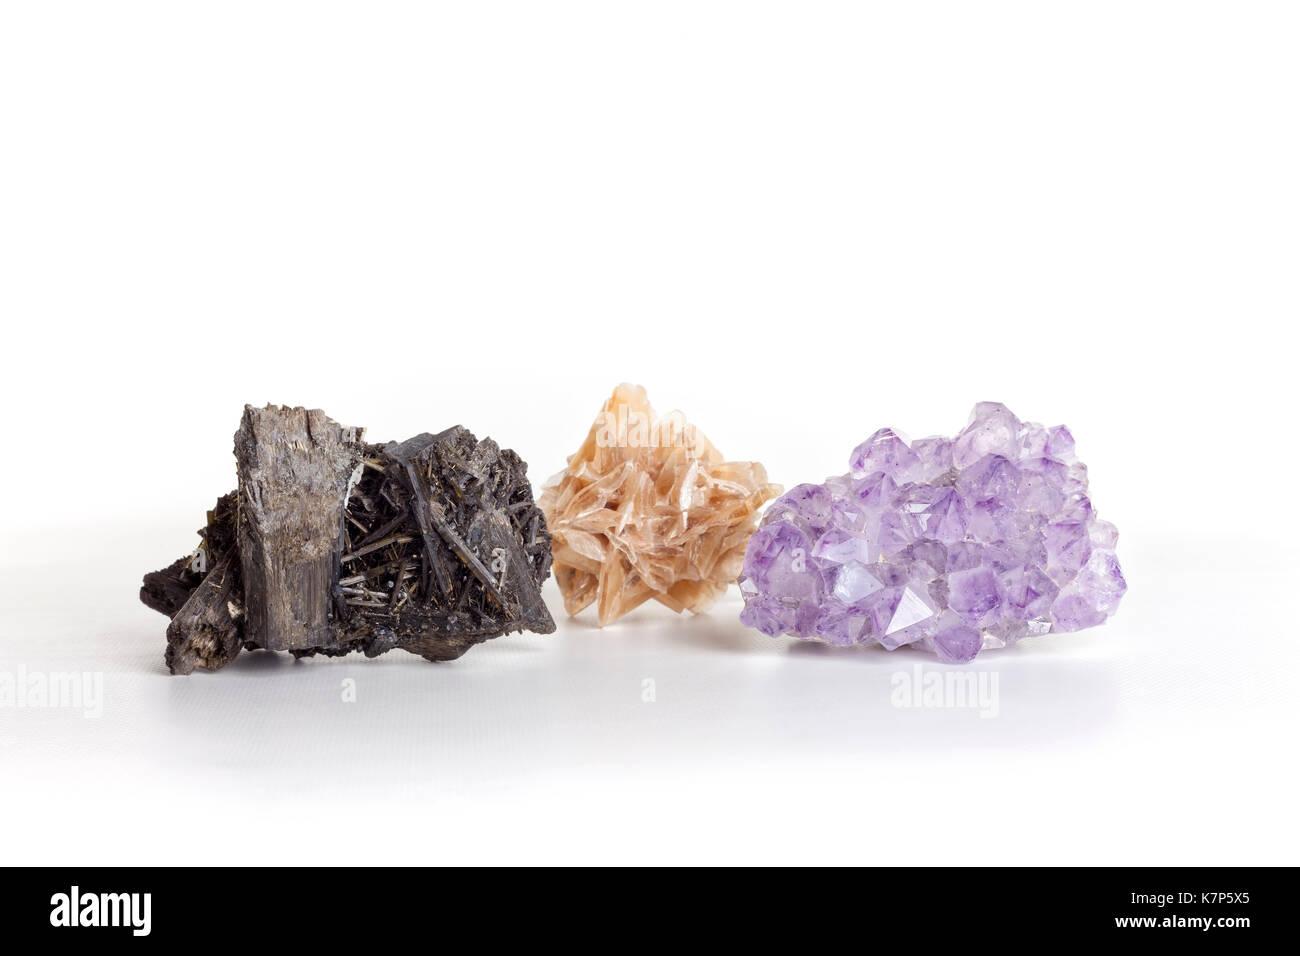 Barite, fluorite and gypsum. - Stock Image